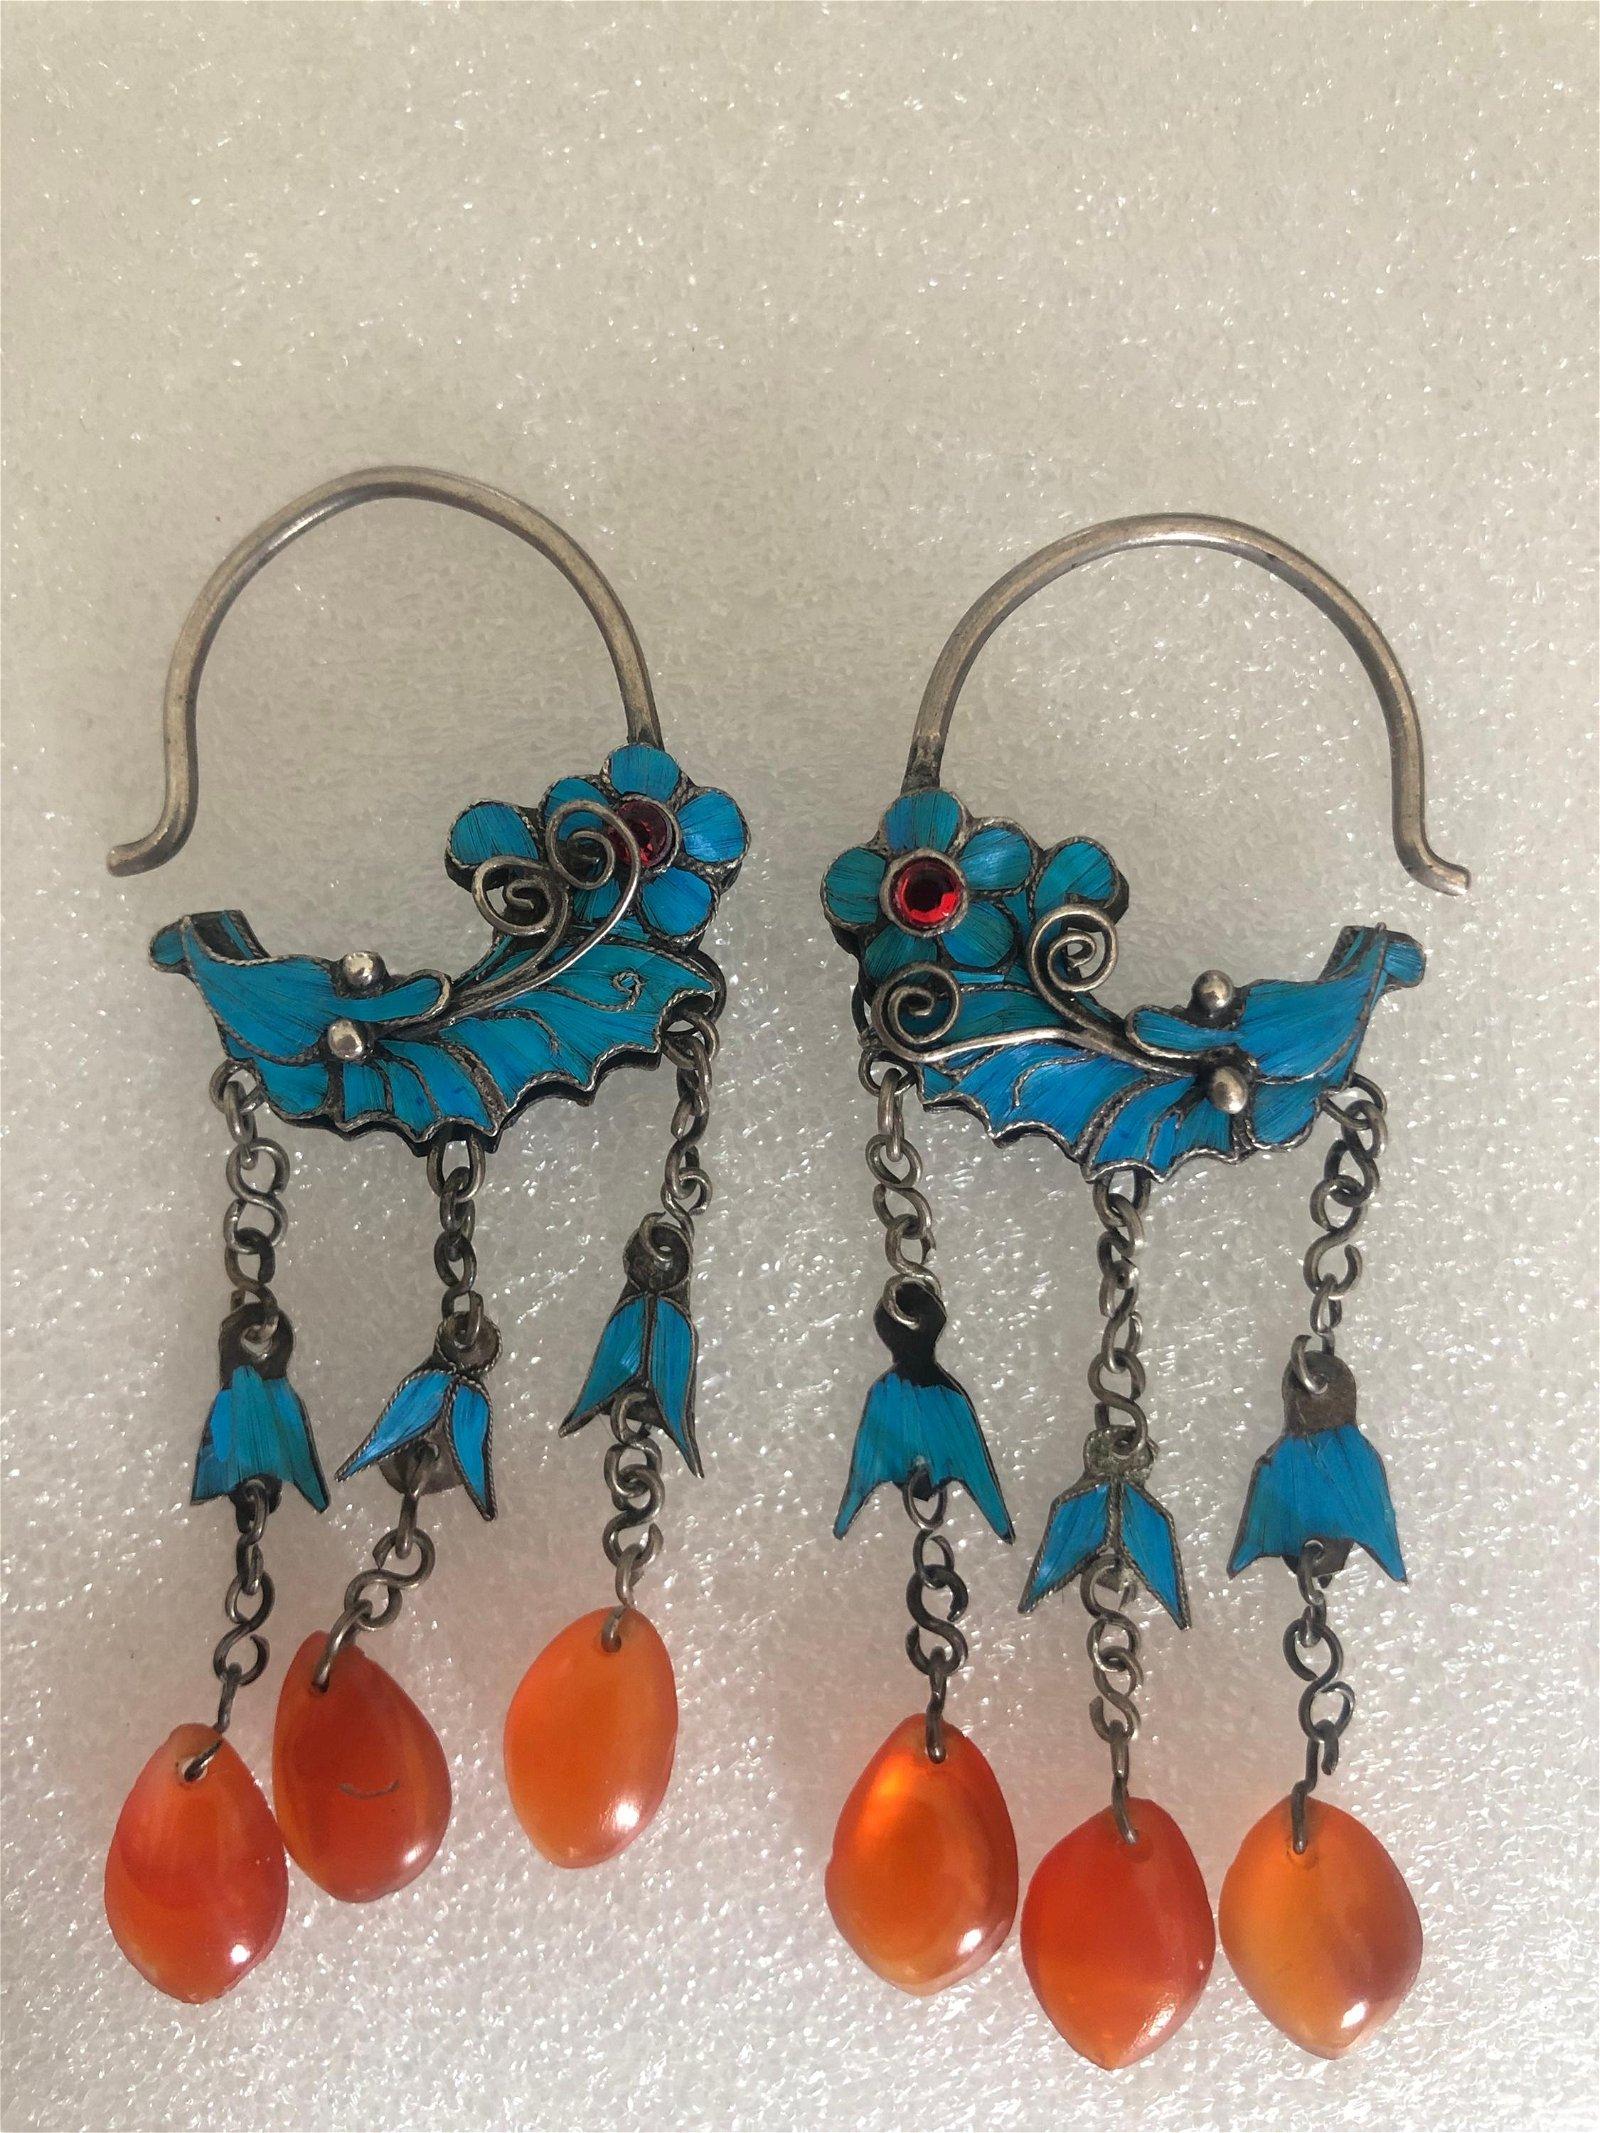 19TH Diancui Agate Earrings